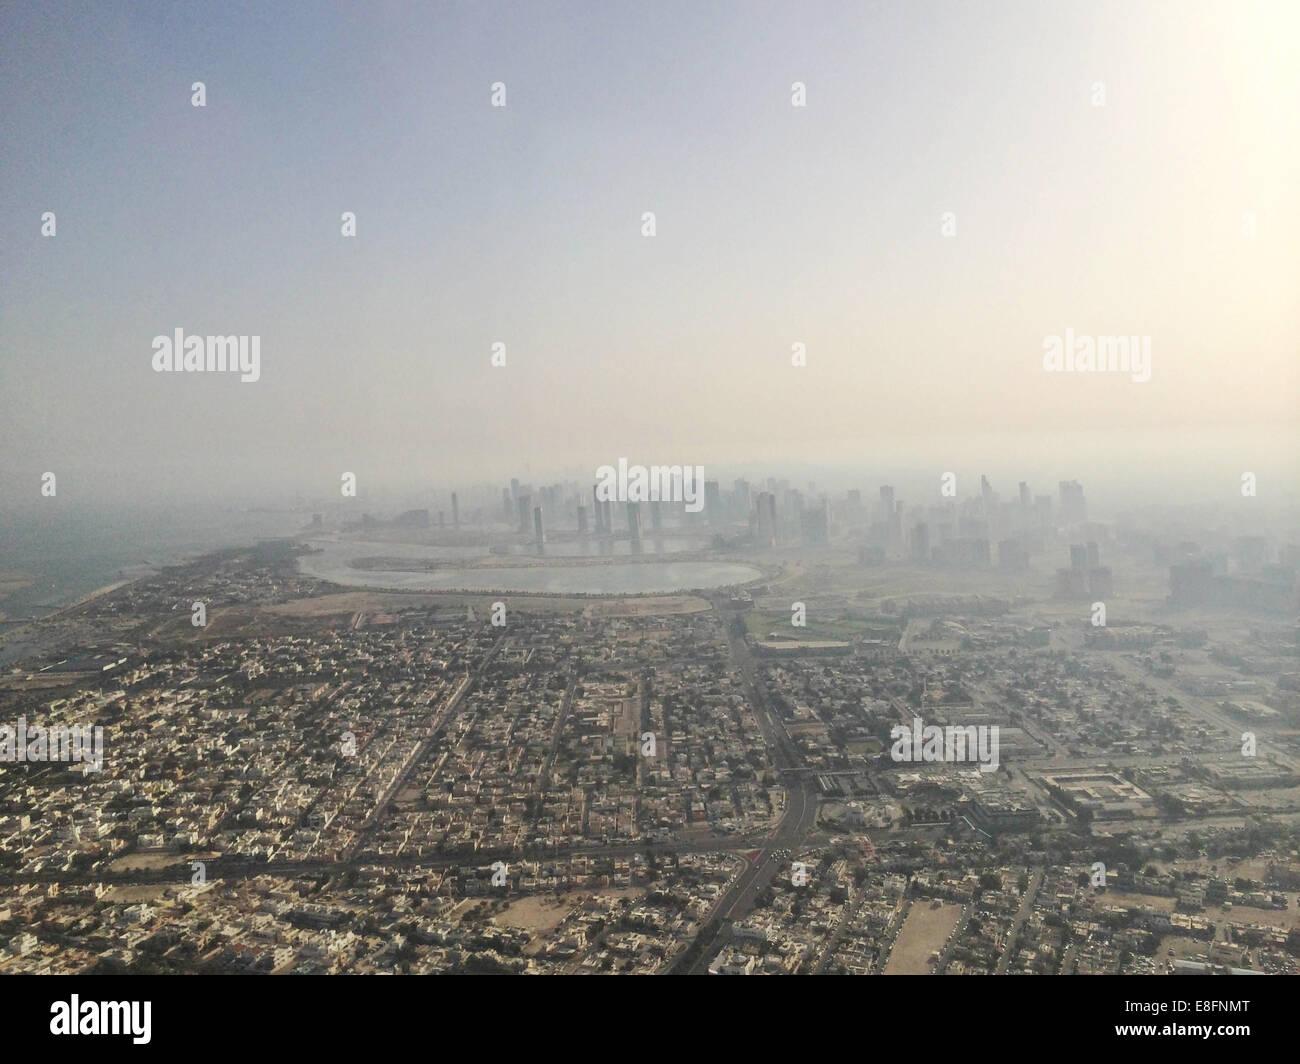 United Arab Emirates, Dubai and surrounding area from above - Stock Image